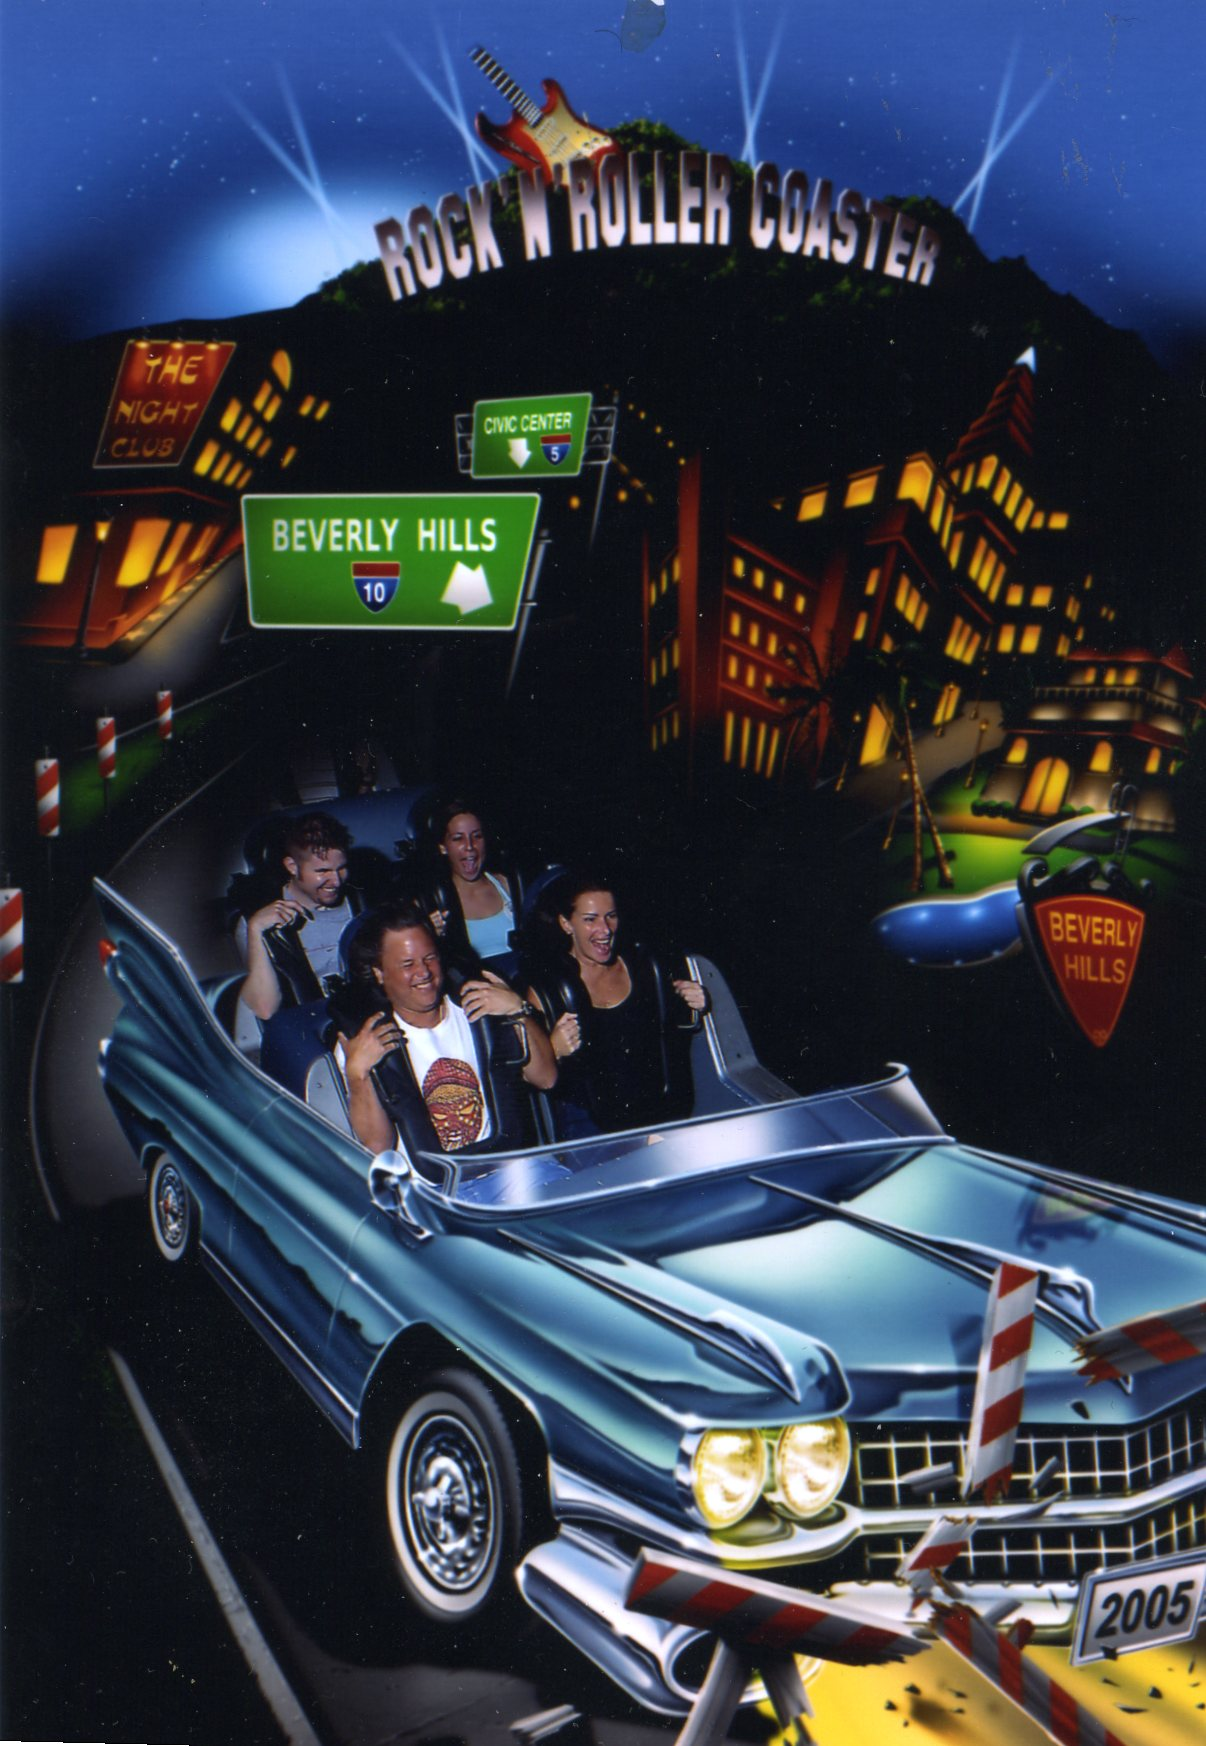 Kevin Kolenda Aerosmith Roller Coaster Image